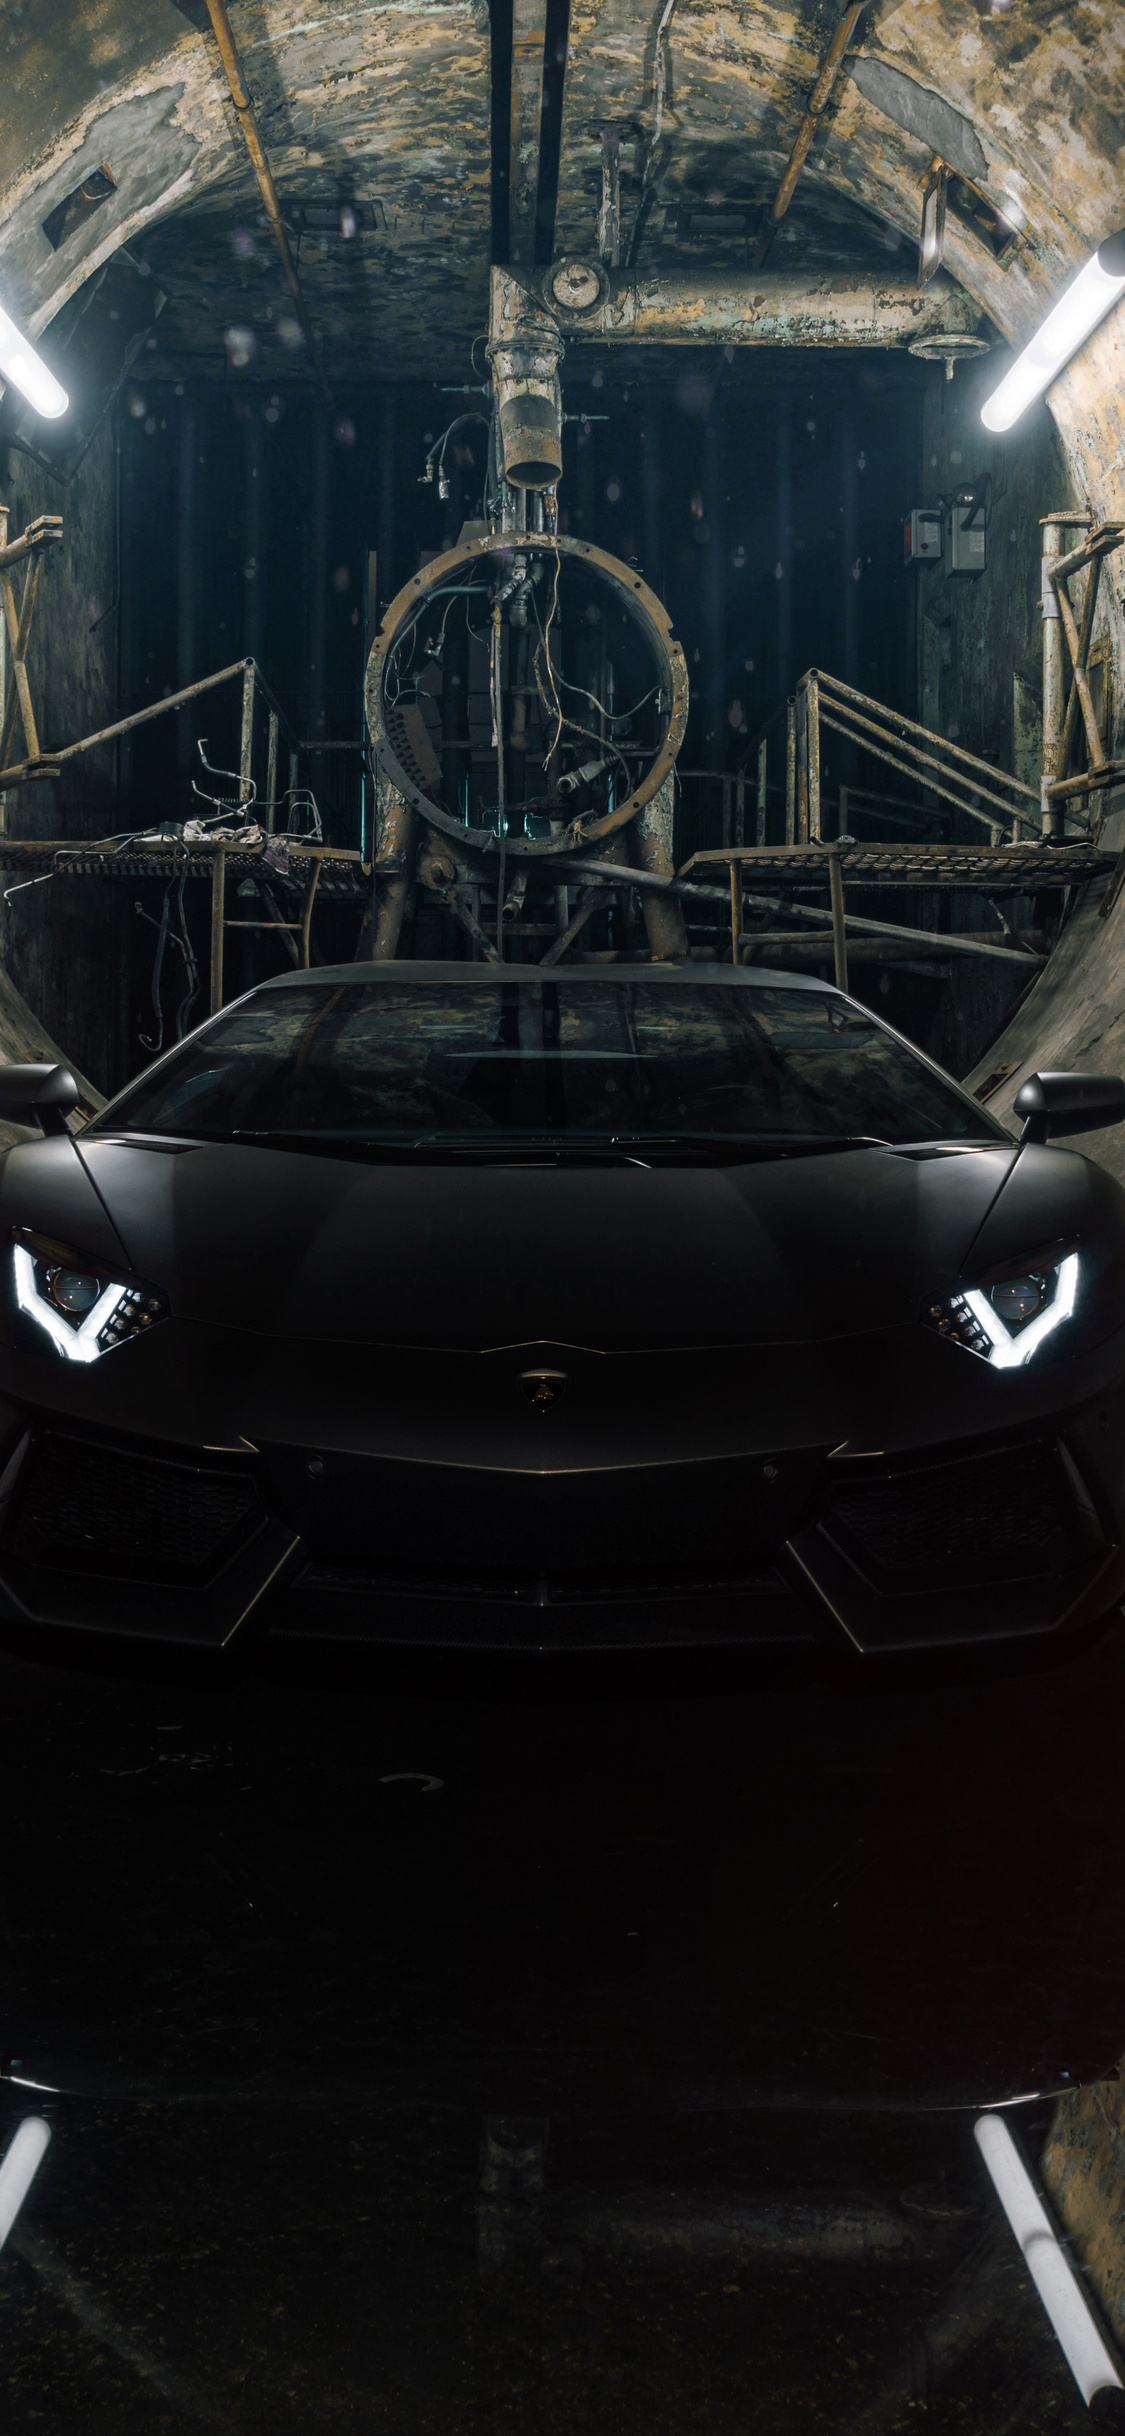 1125x2436 Black Lamborghini Aventador Iphone Xs Iphone 10